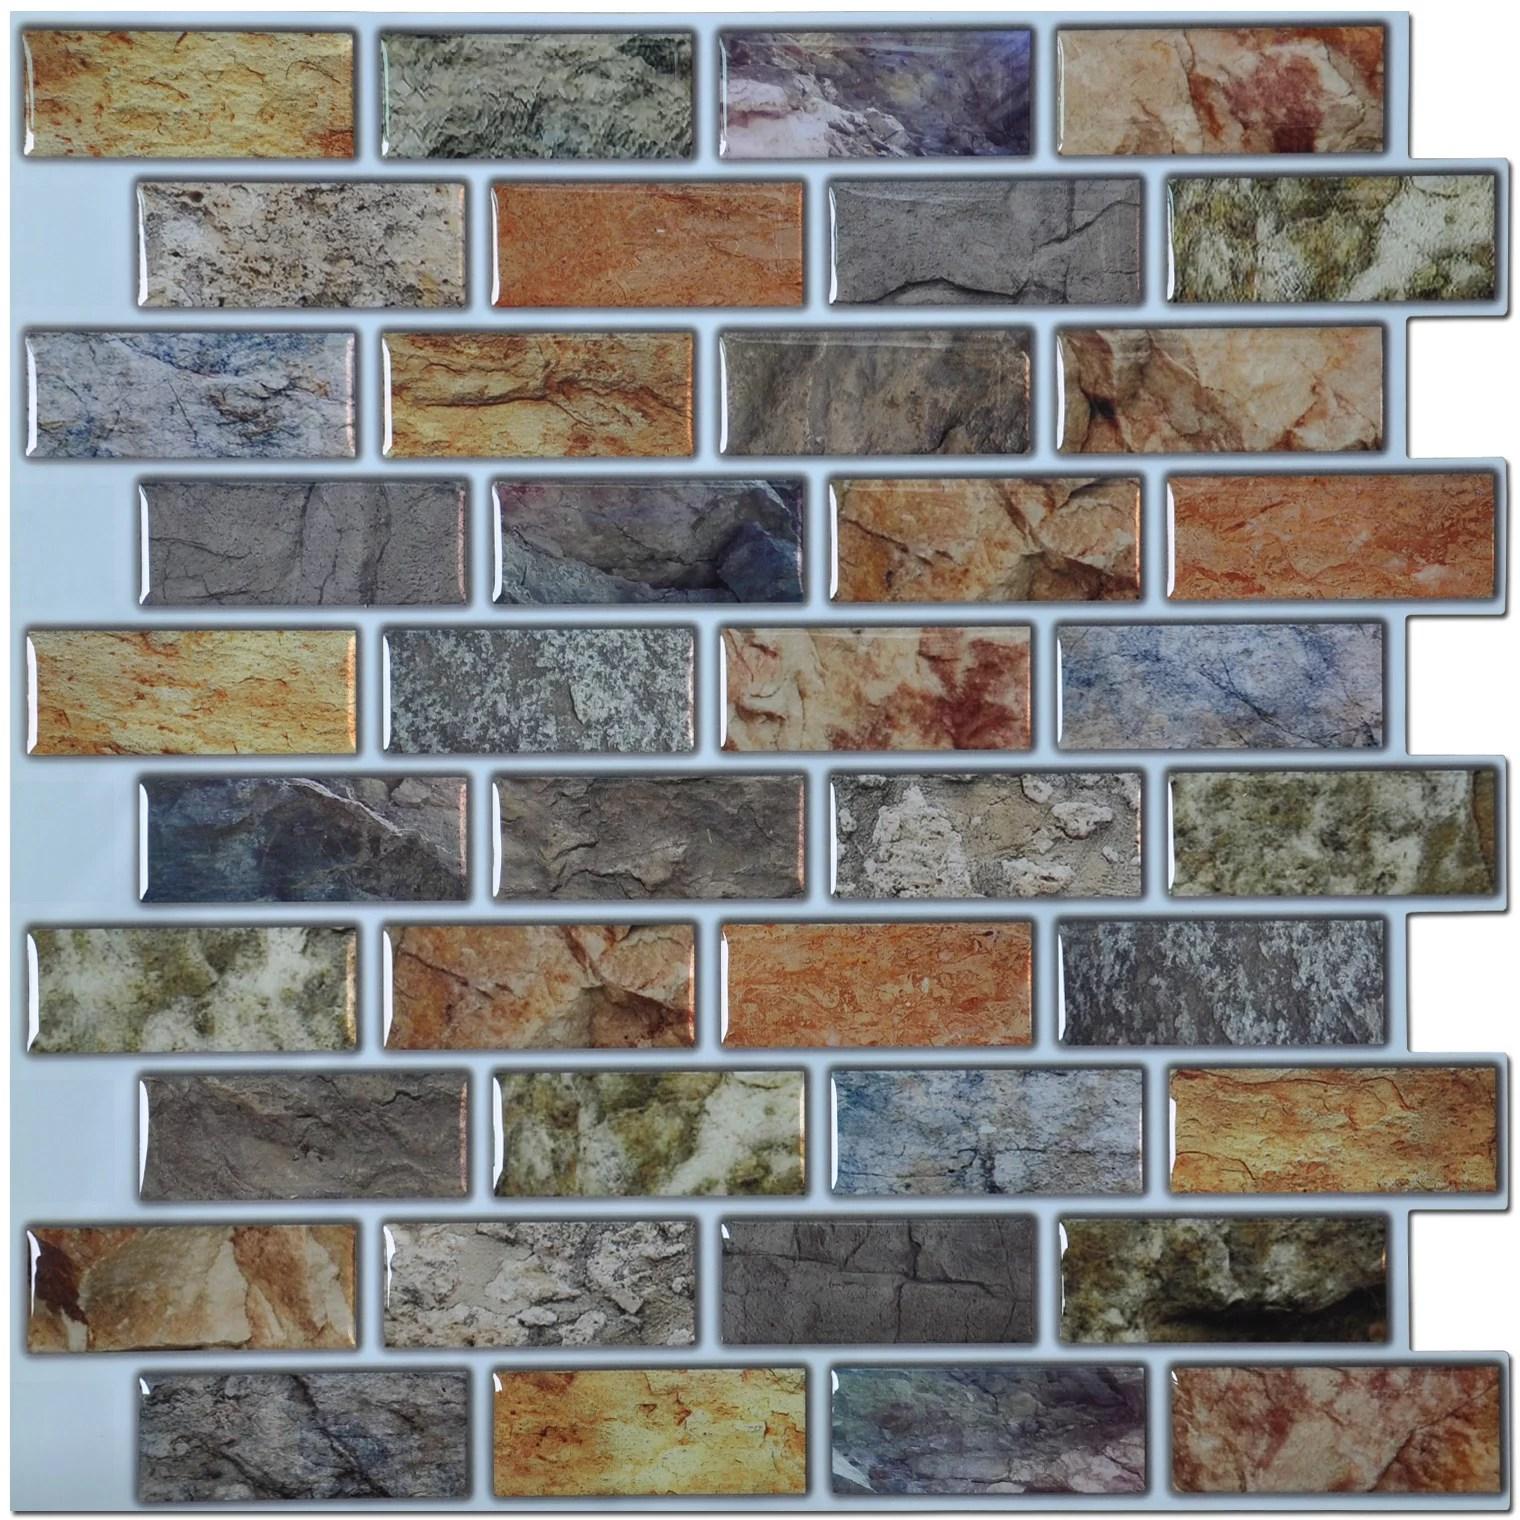 Art3d Backsplash Peel N Stick Tiles Kitchen Bathroom Backsplash Tiles 12 X 12 Pack Of 6 Walmart Com Walmart Com